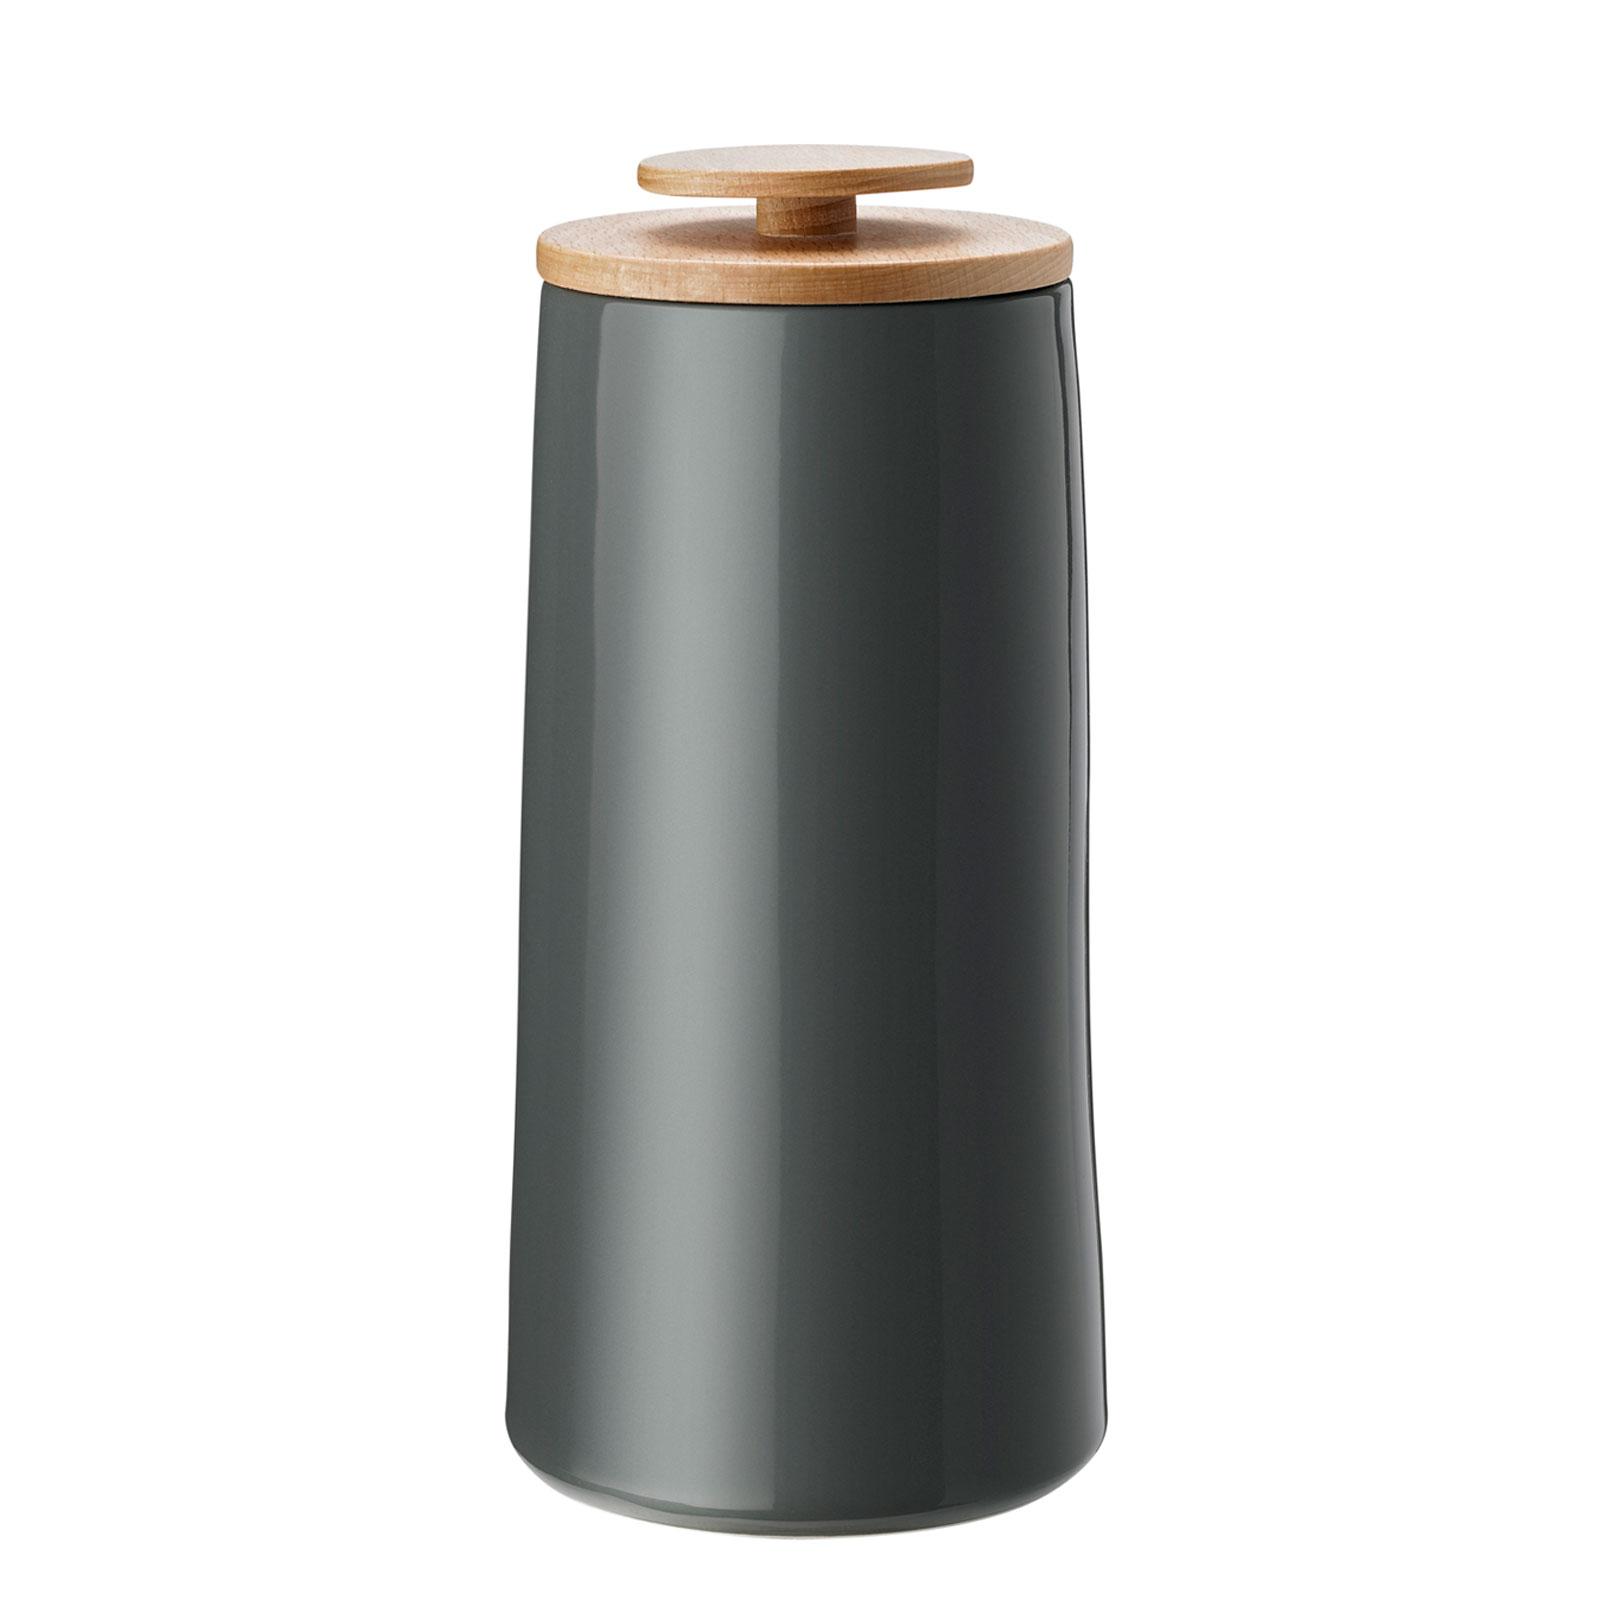 stelton Emma Kaffeedose Aufbewahrungsdose 500 g grau